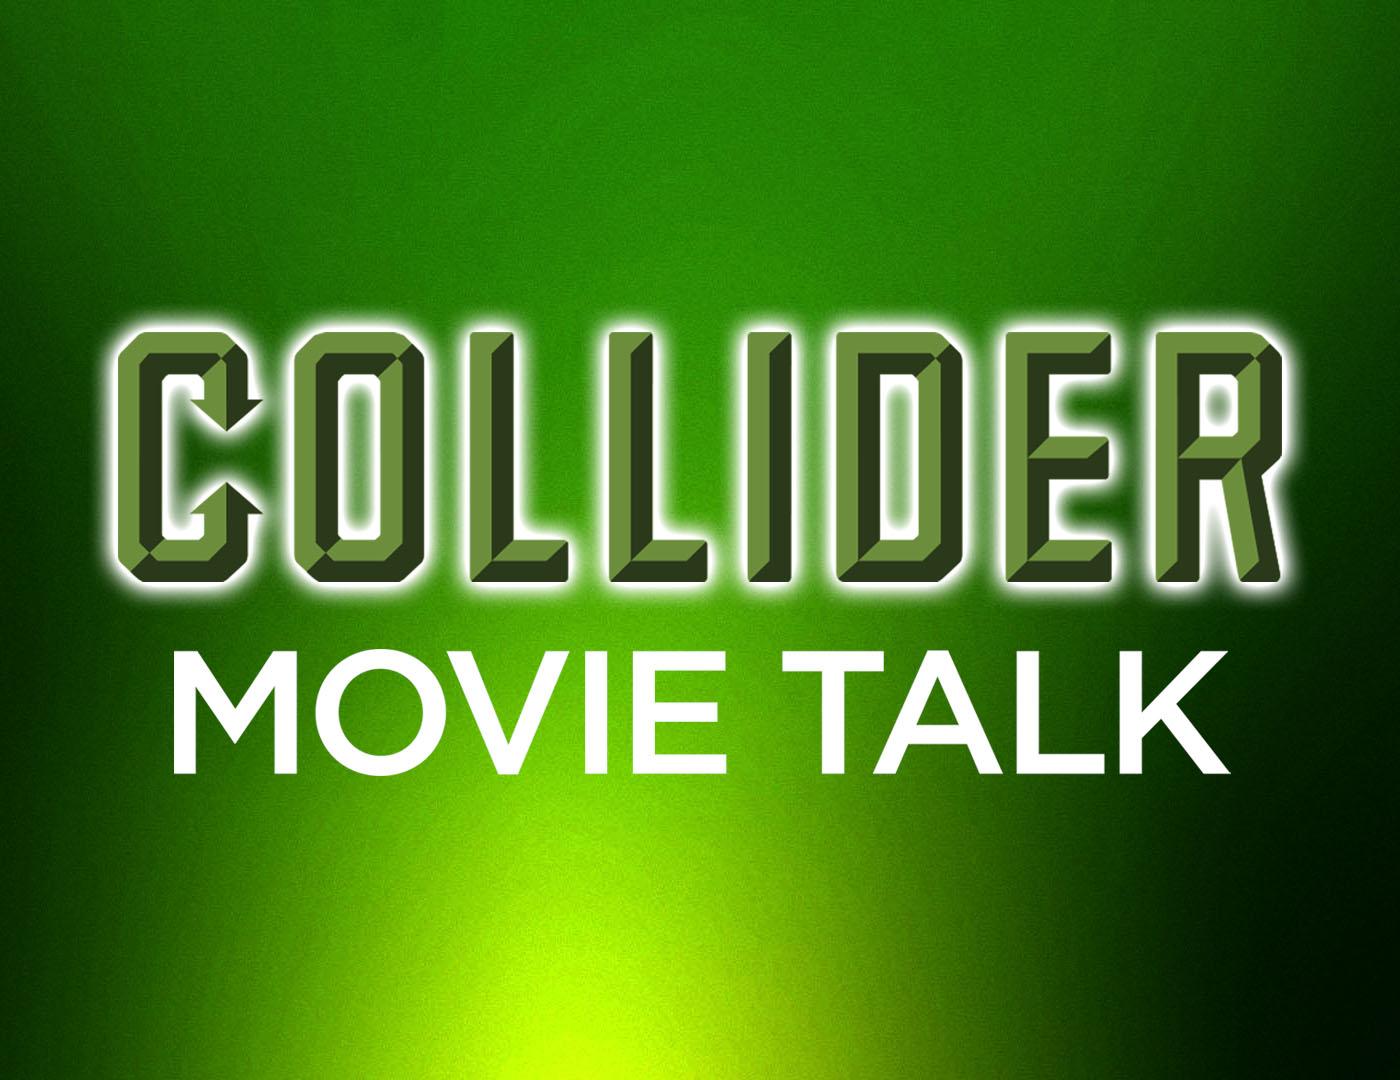 Collider Movie Talk - New Batman V Superman Spots, Academy Awards Changes